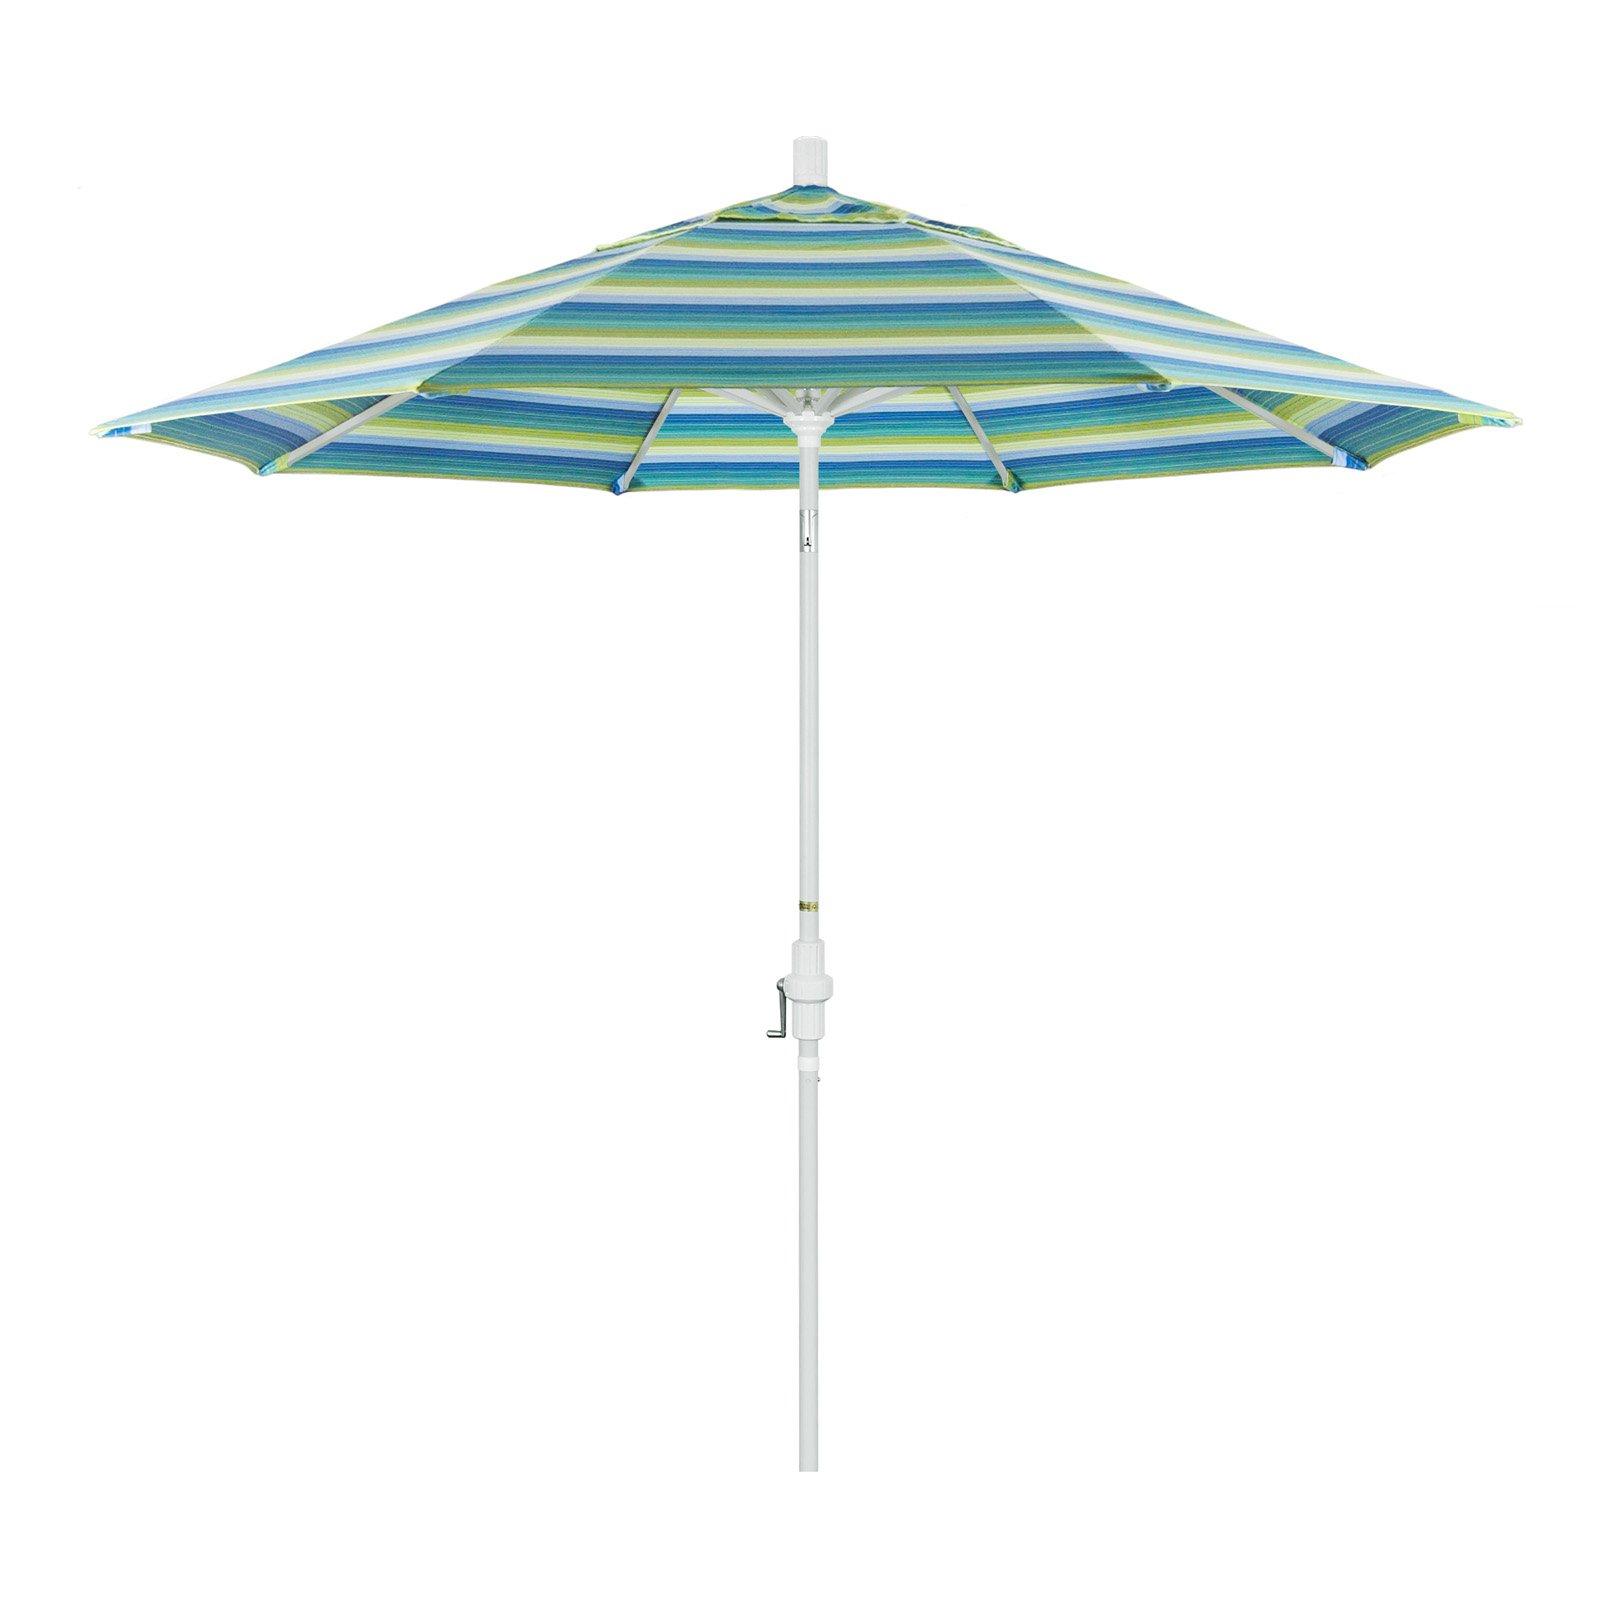 Muldoon Market Umbrellas Within Famous California Umbrella 9 Ft (View 12 of 20)